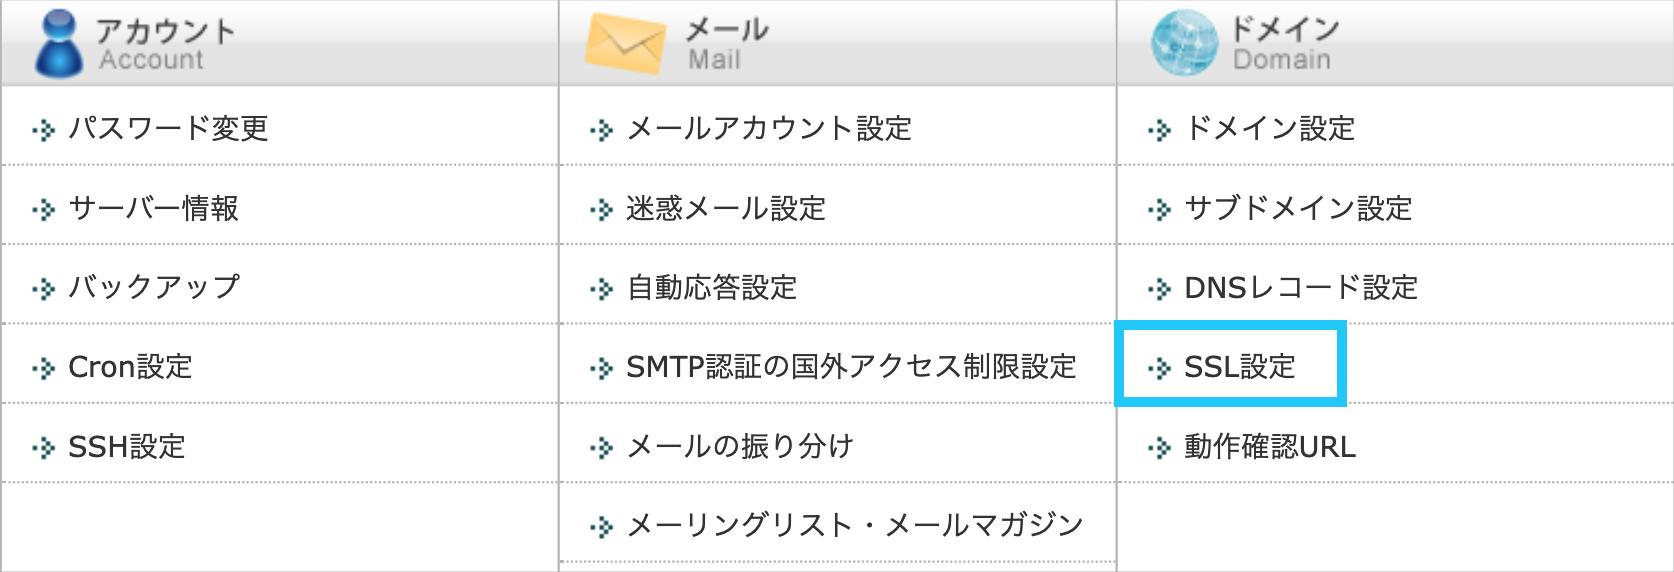 XserverでSSL化設定をする